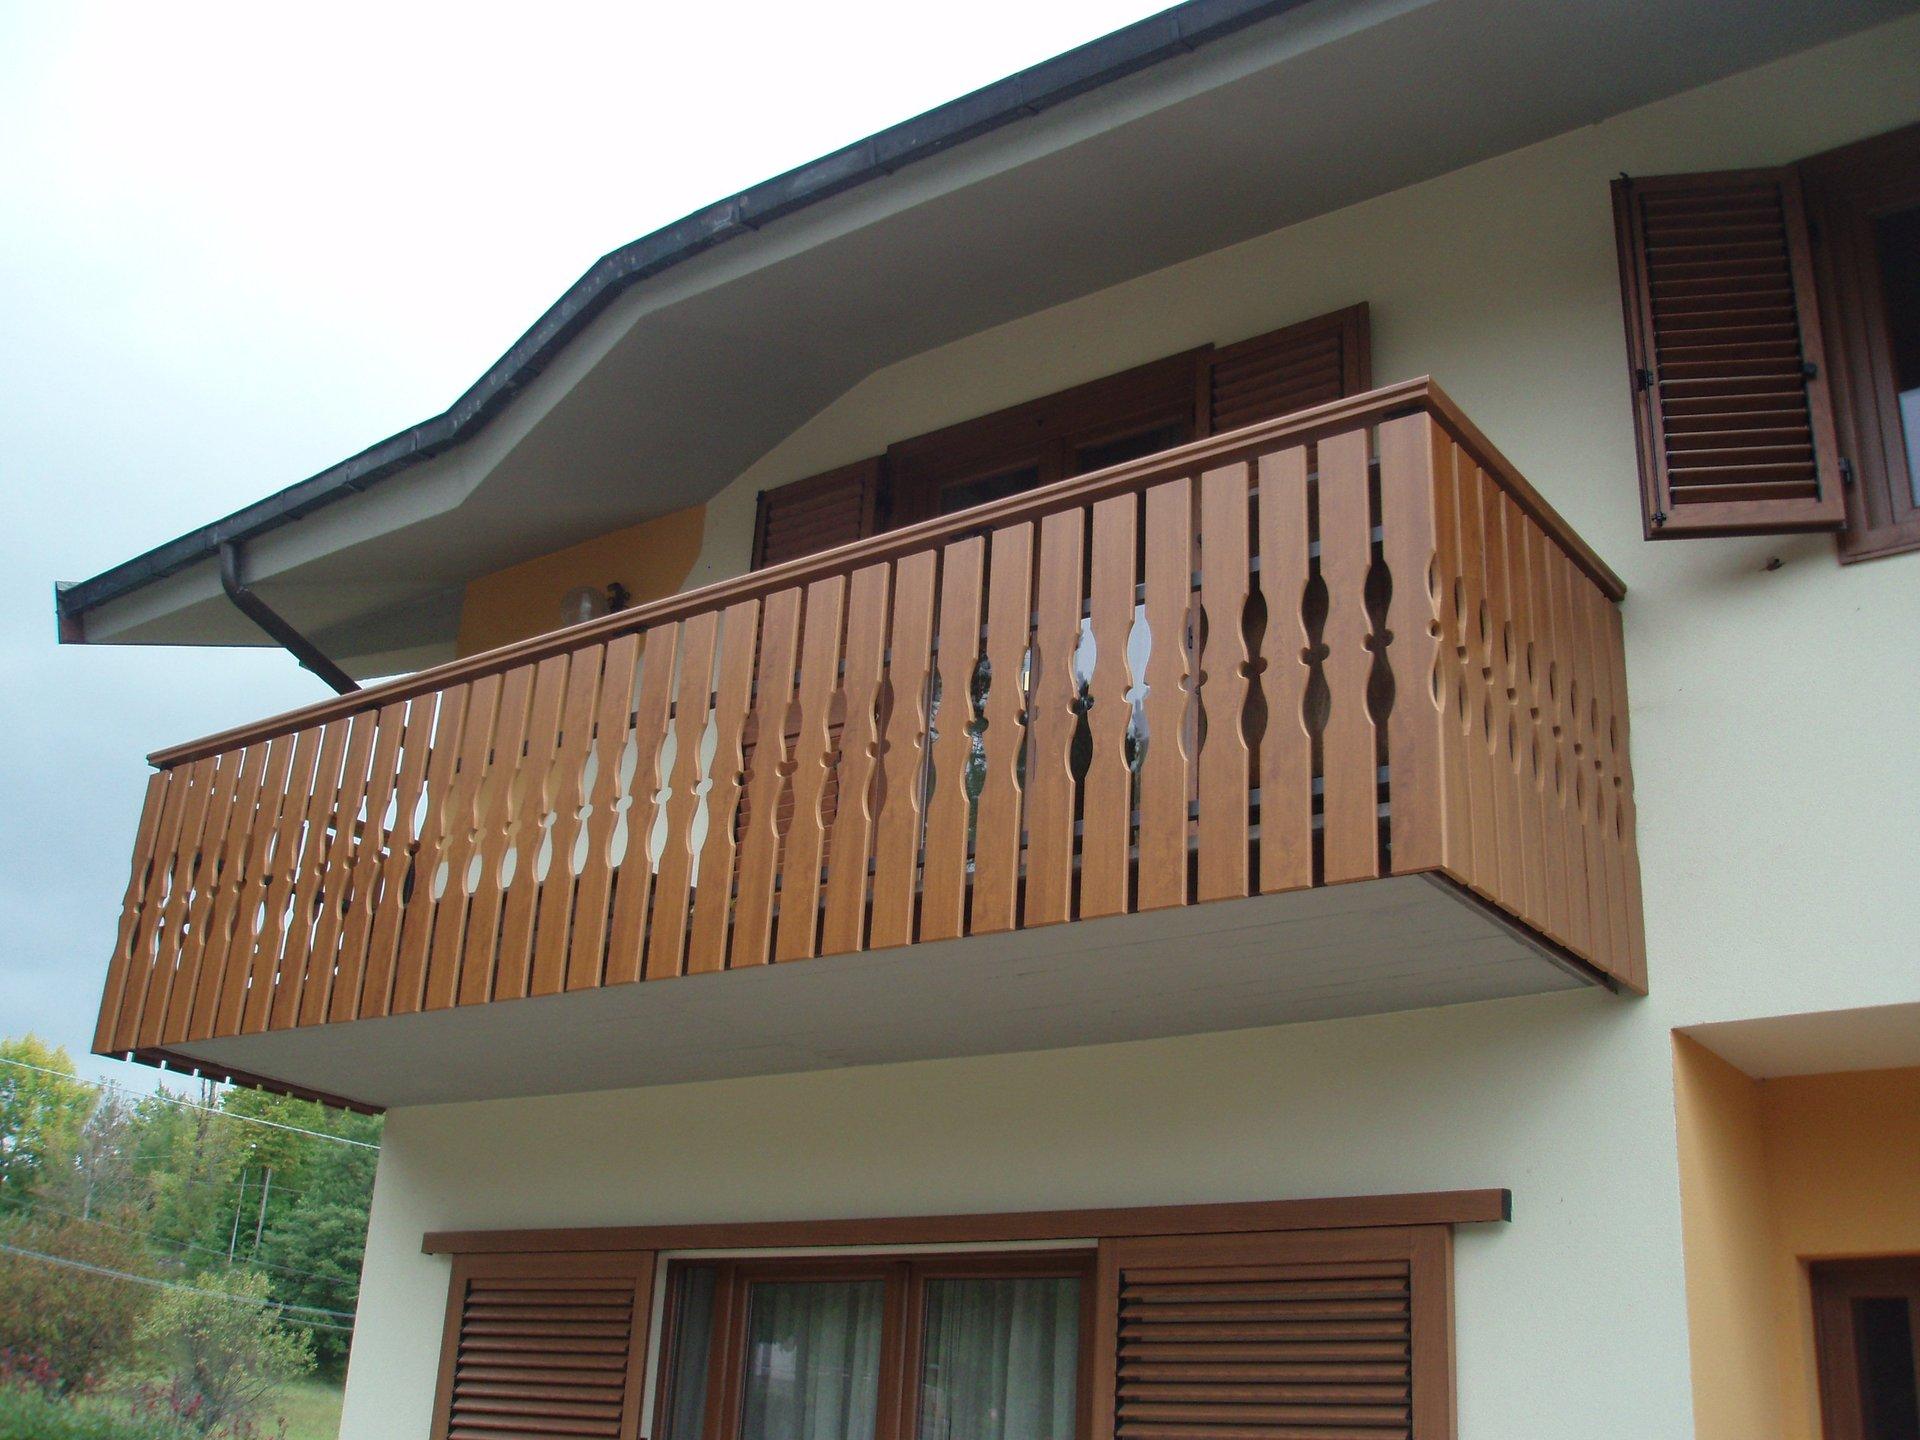 Ringhiera in balcone di una casa